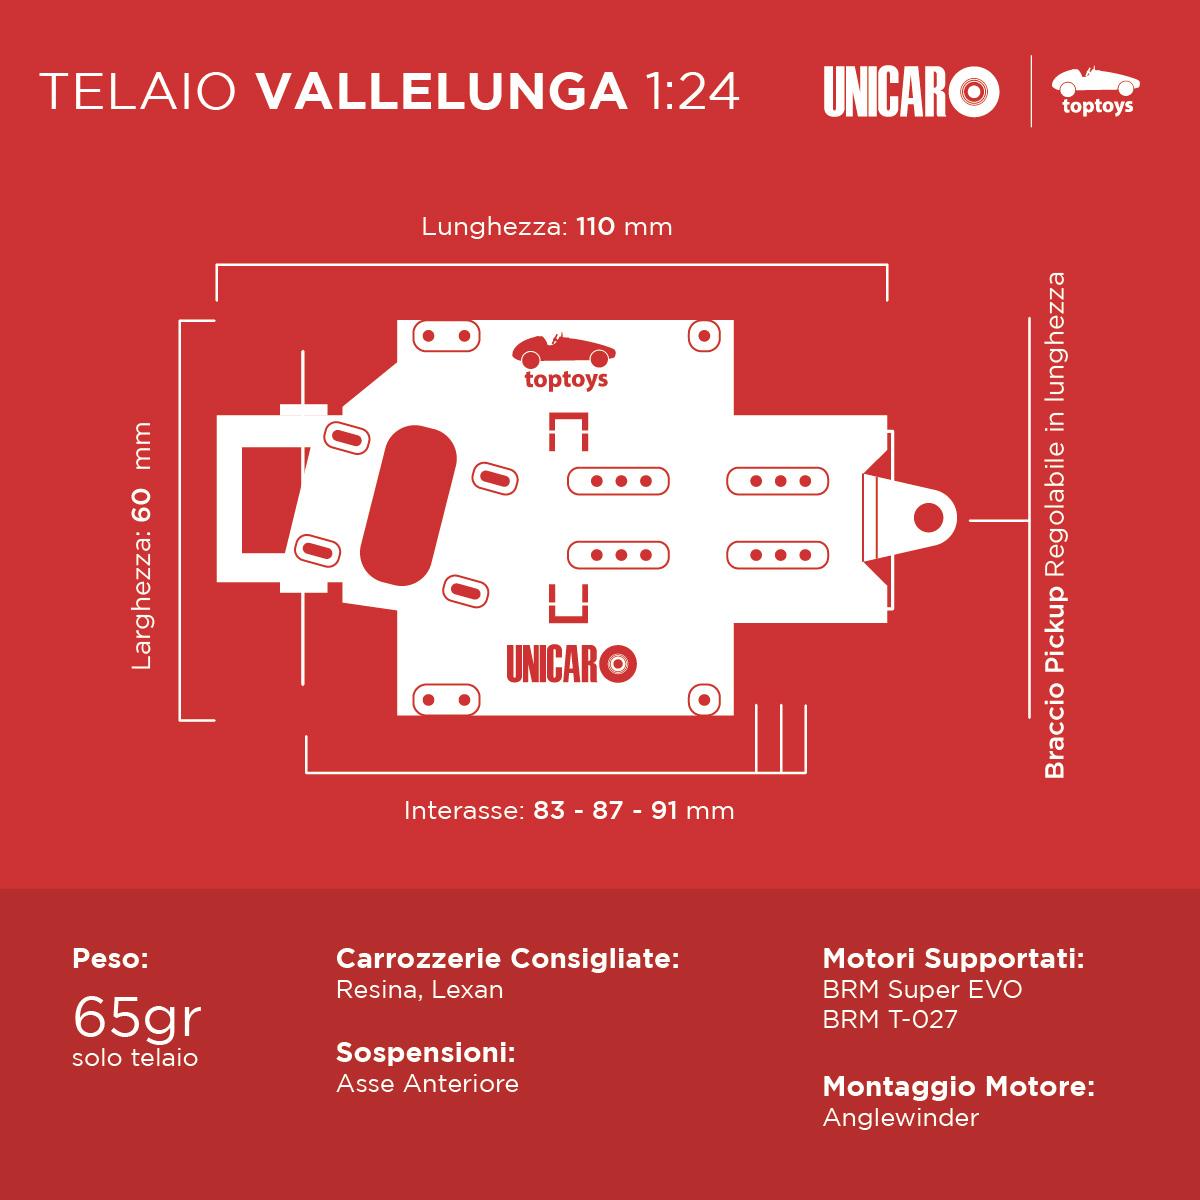 https://www.orlandinifrancesco.com/wp/wp-content/uploads/2019/06/Scheda-Tecnica-Telaio-Vallelunga.jpg